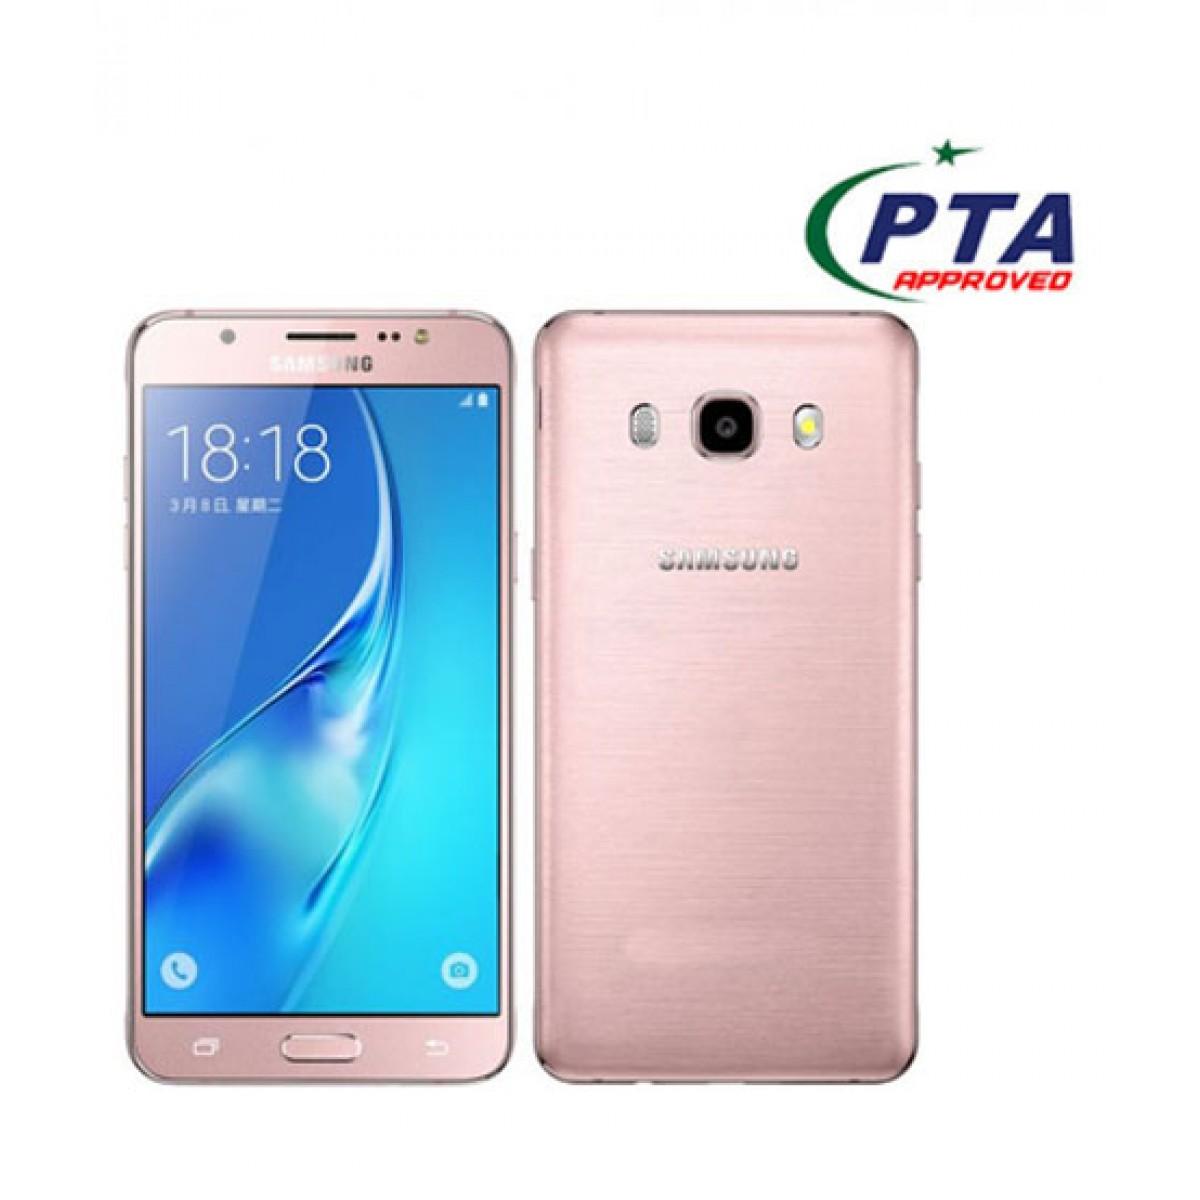 Samsung Galaxy J5 2016 16gb Price In Pakistan